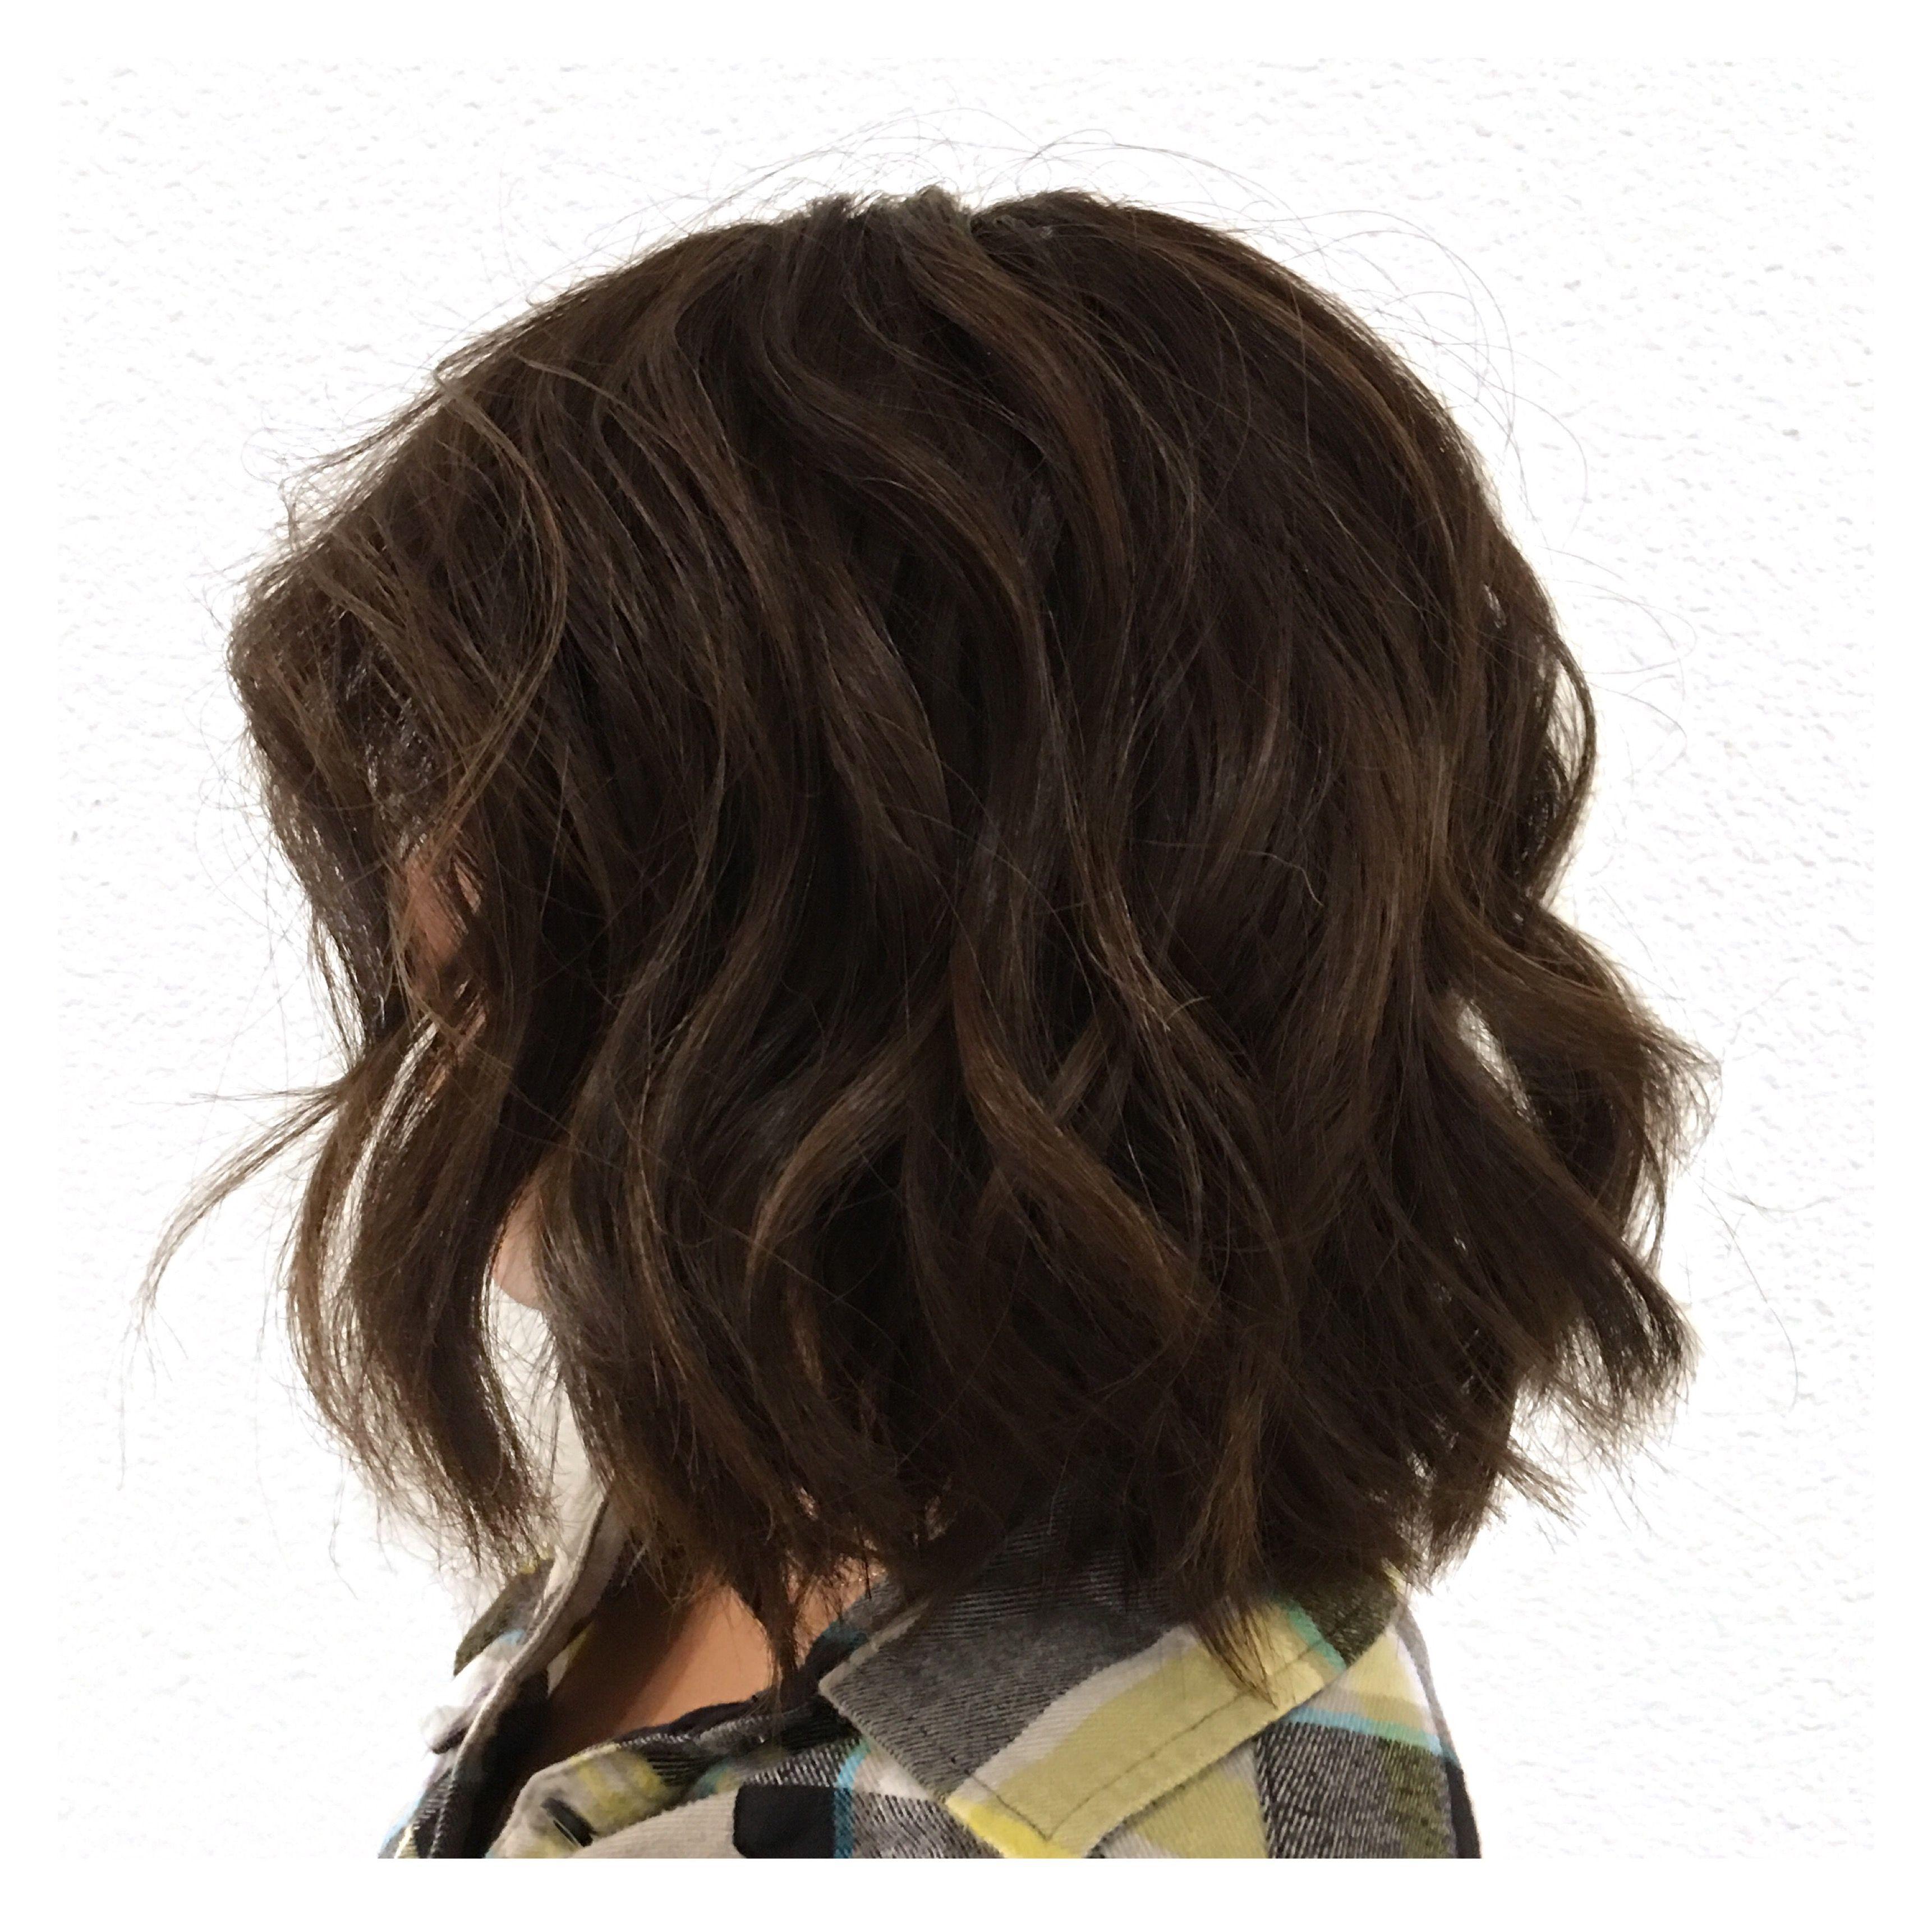 all over dark brown color brunette short haircut lob waves